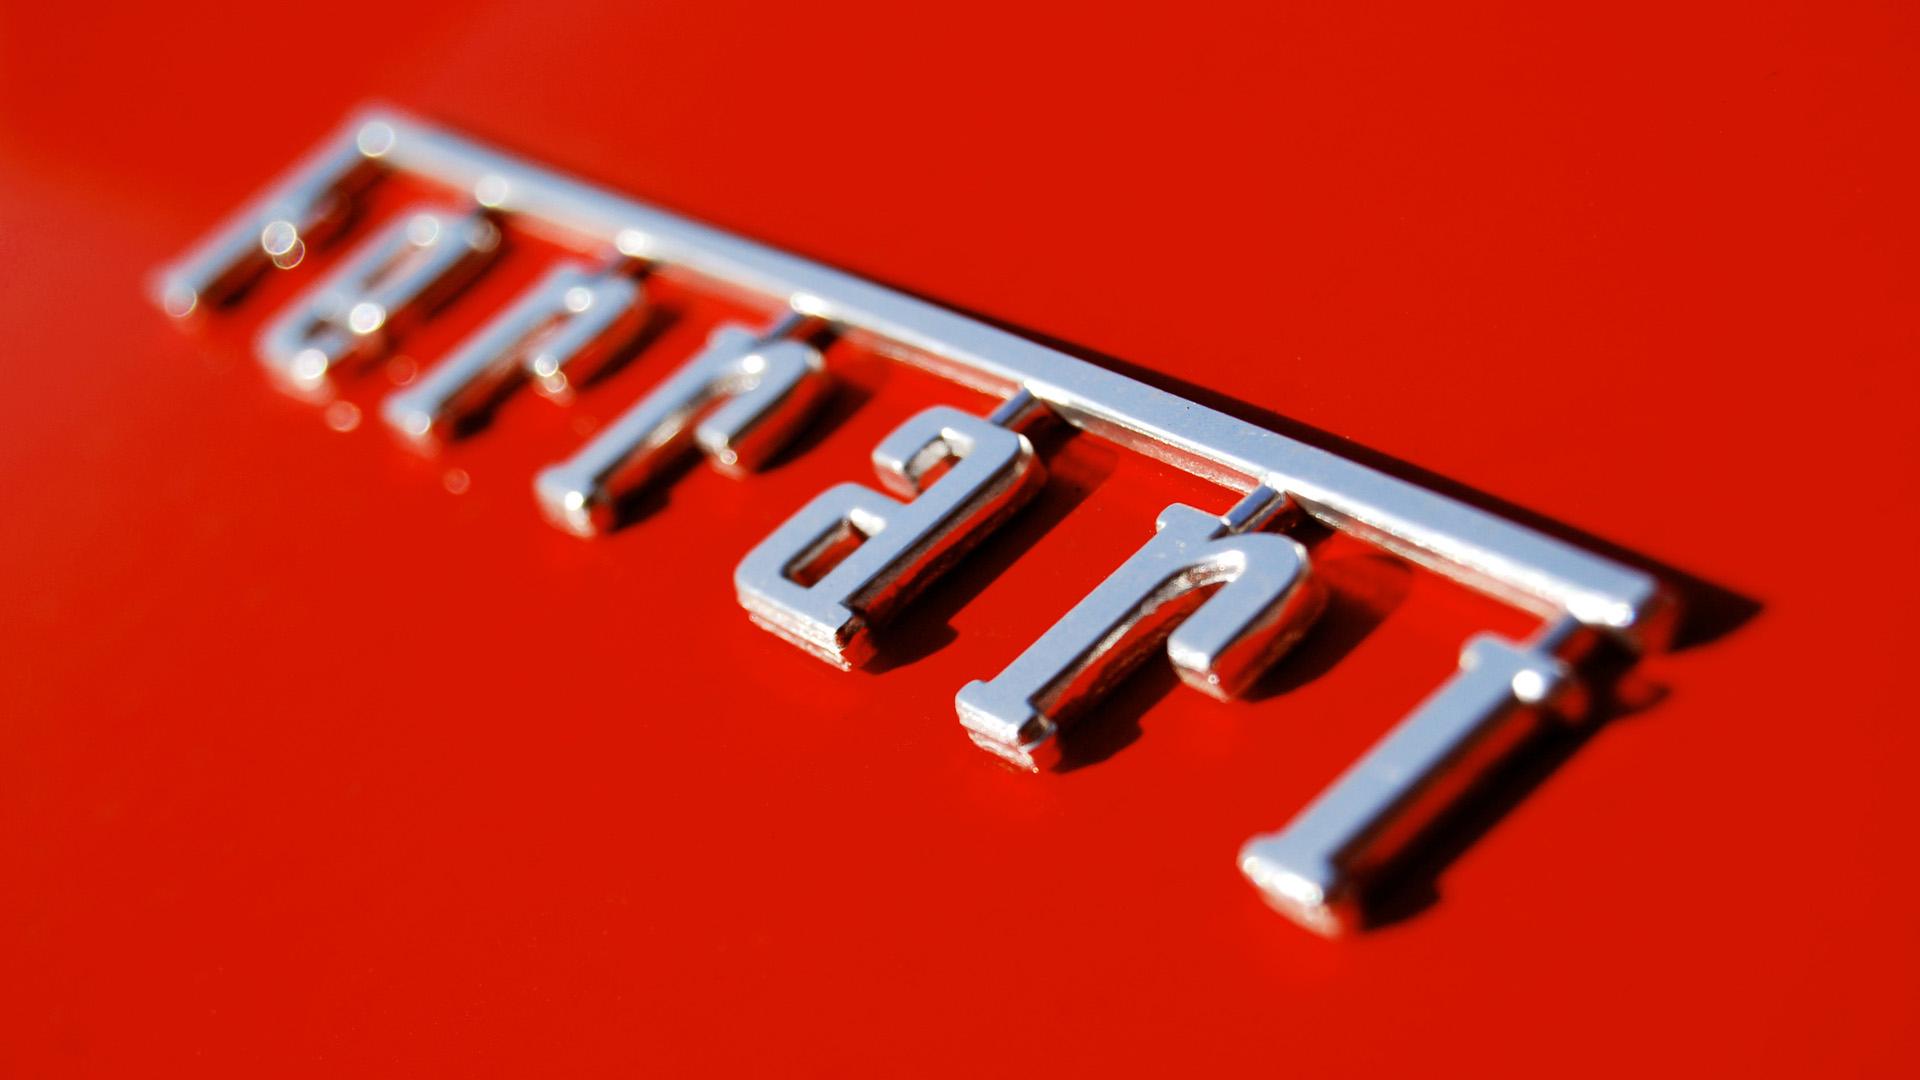 Amazing Wallpaper Logo Ferrari - ferrari-logo-desktop-wallpaper-pictures-58909-60687-hd-wallpapers  Gallery_581581.jpg